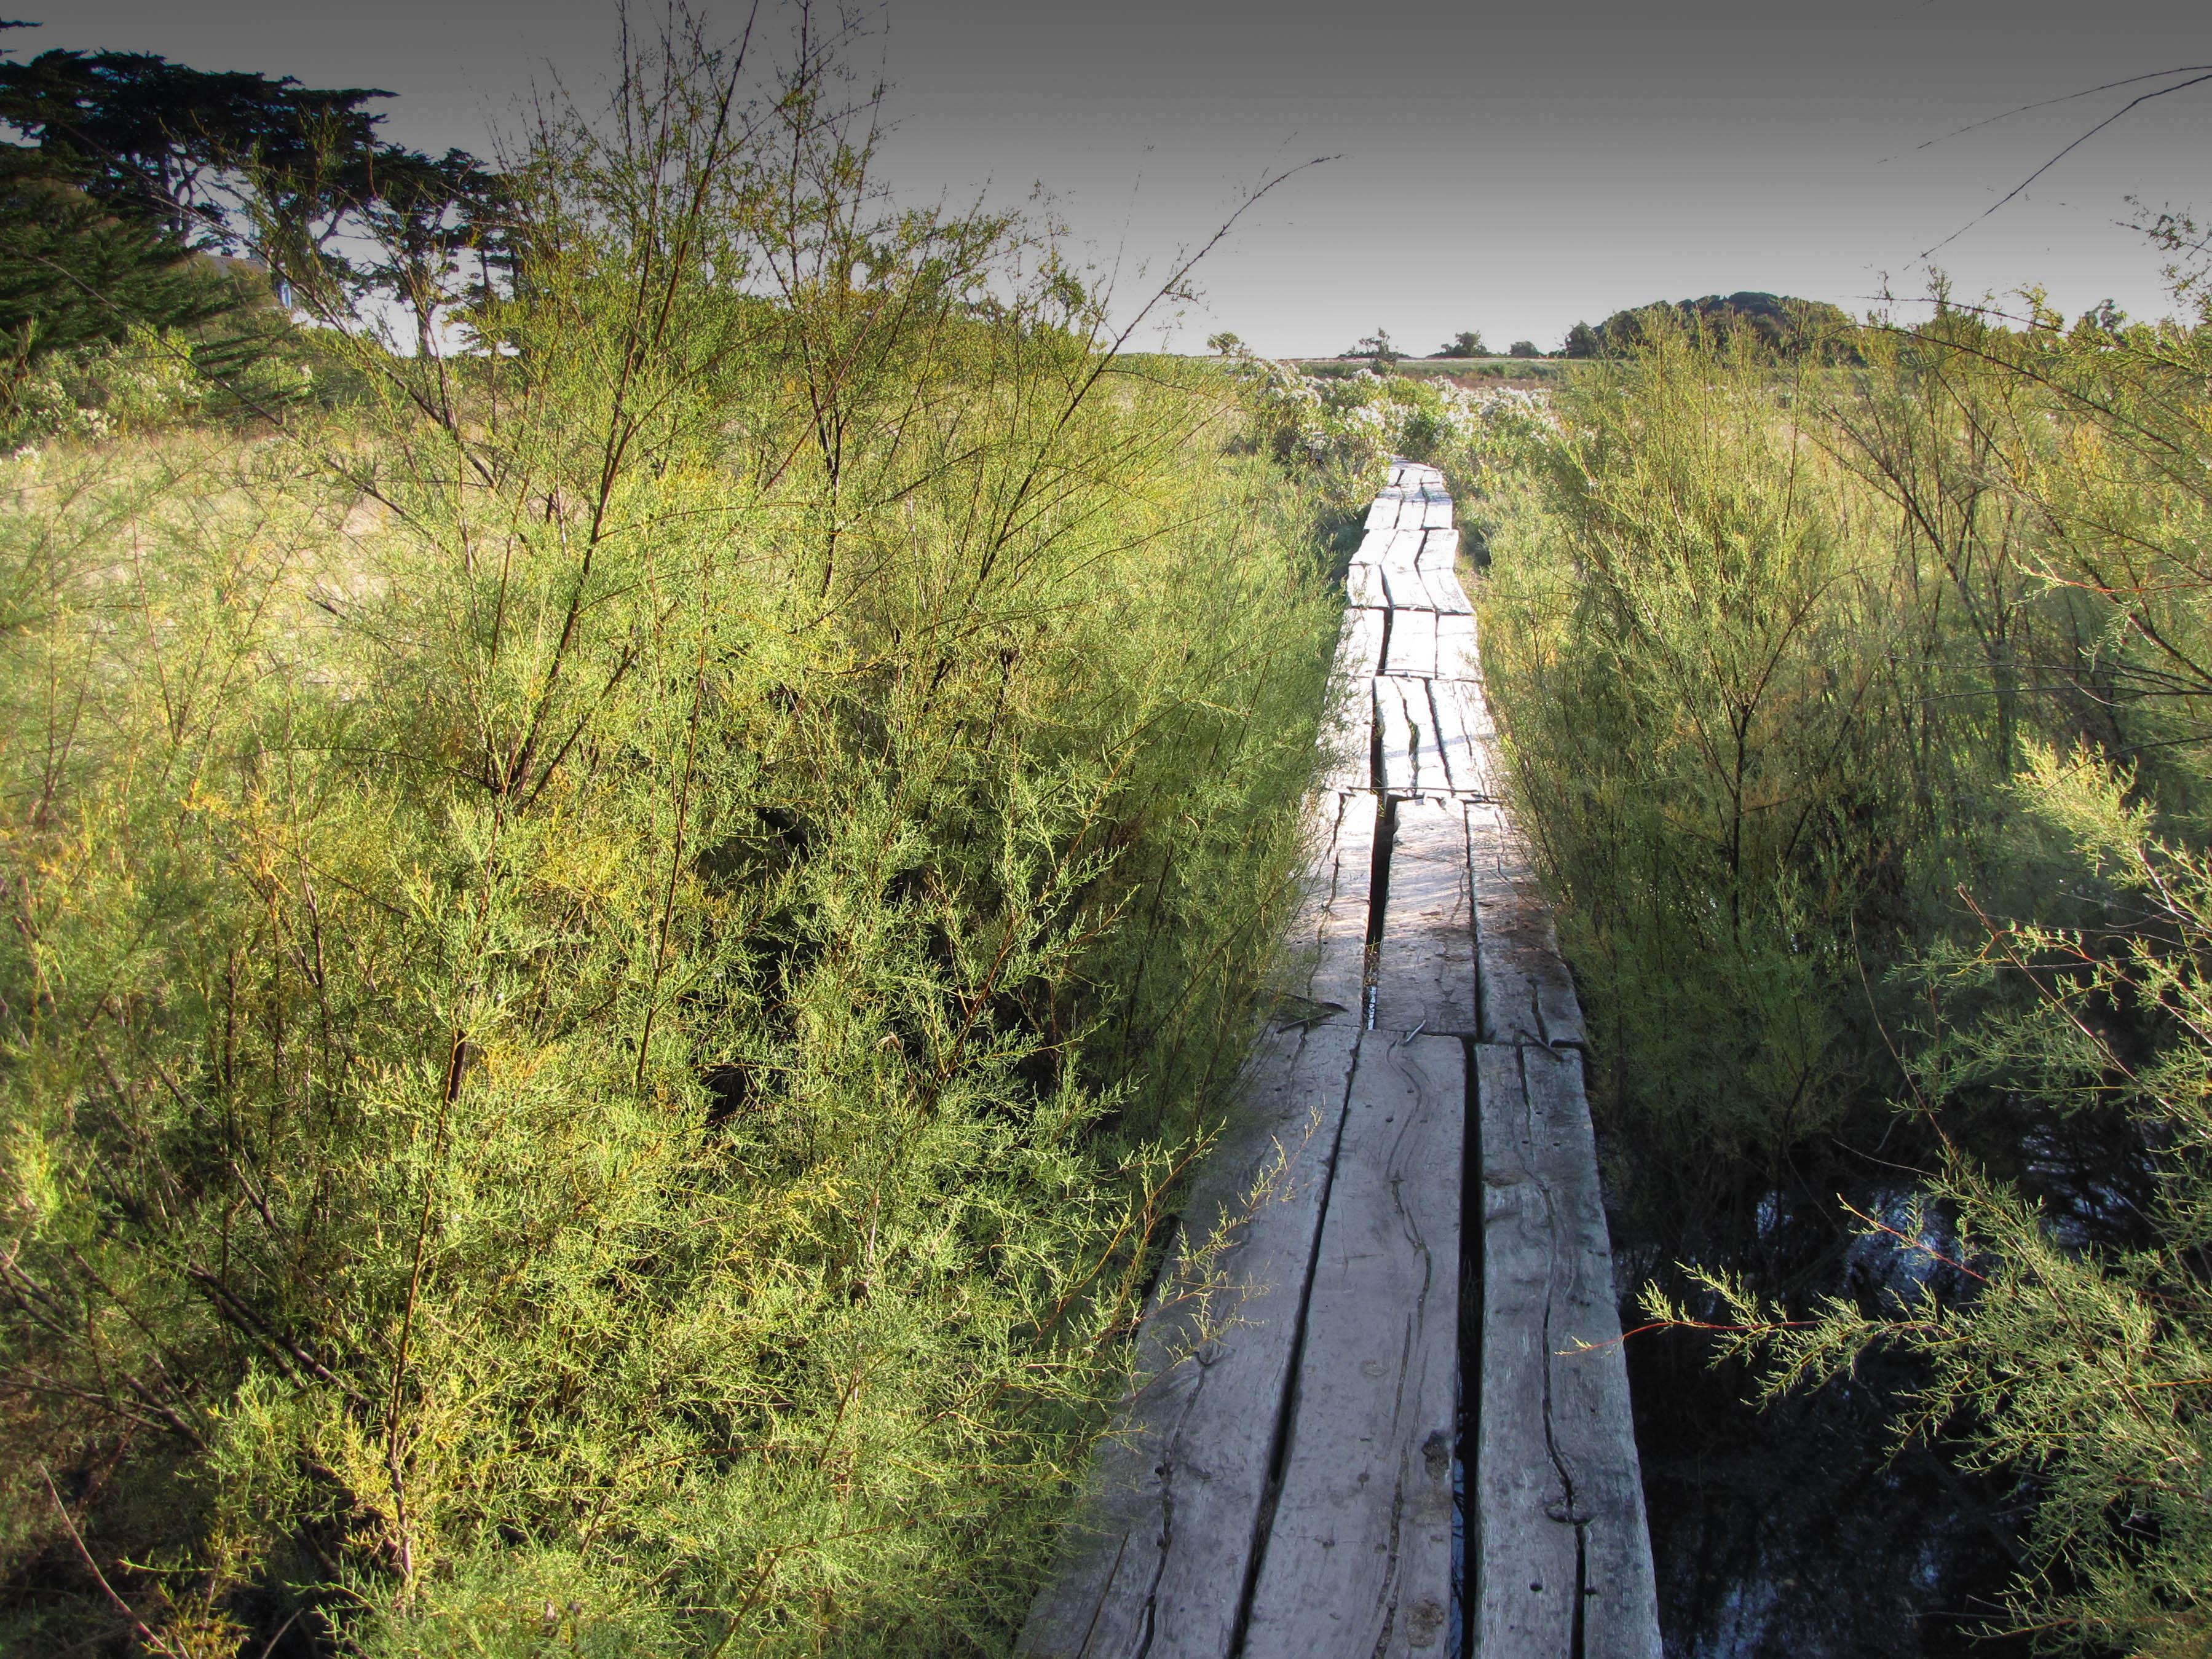 le chemin de bois 2, Brénéguy, 25 oct 10.jpg